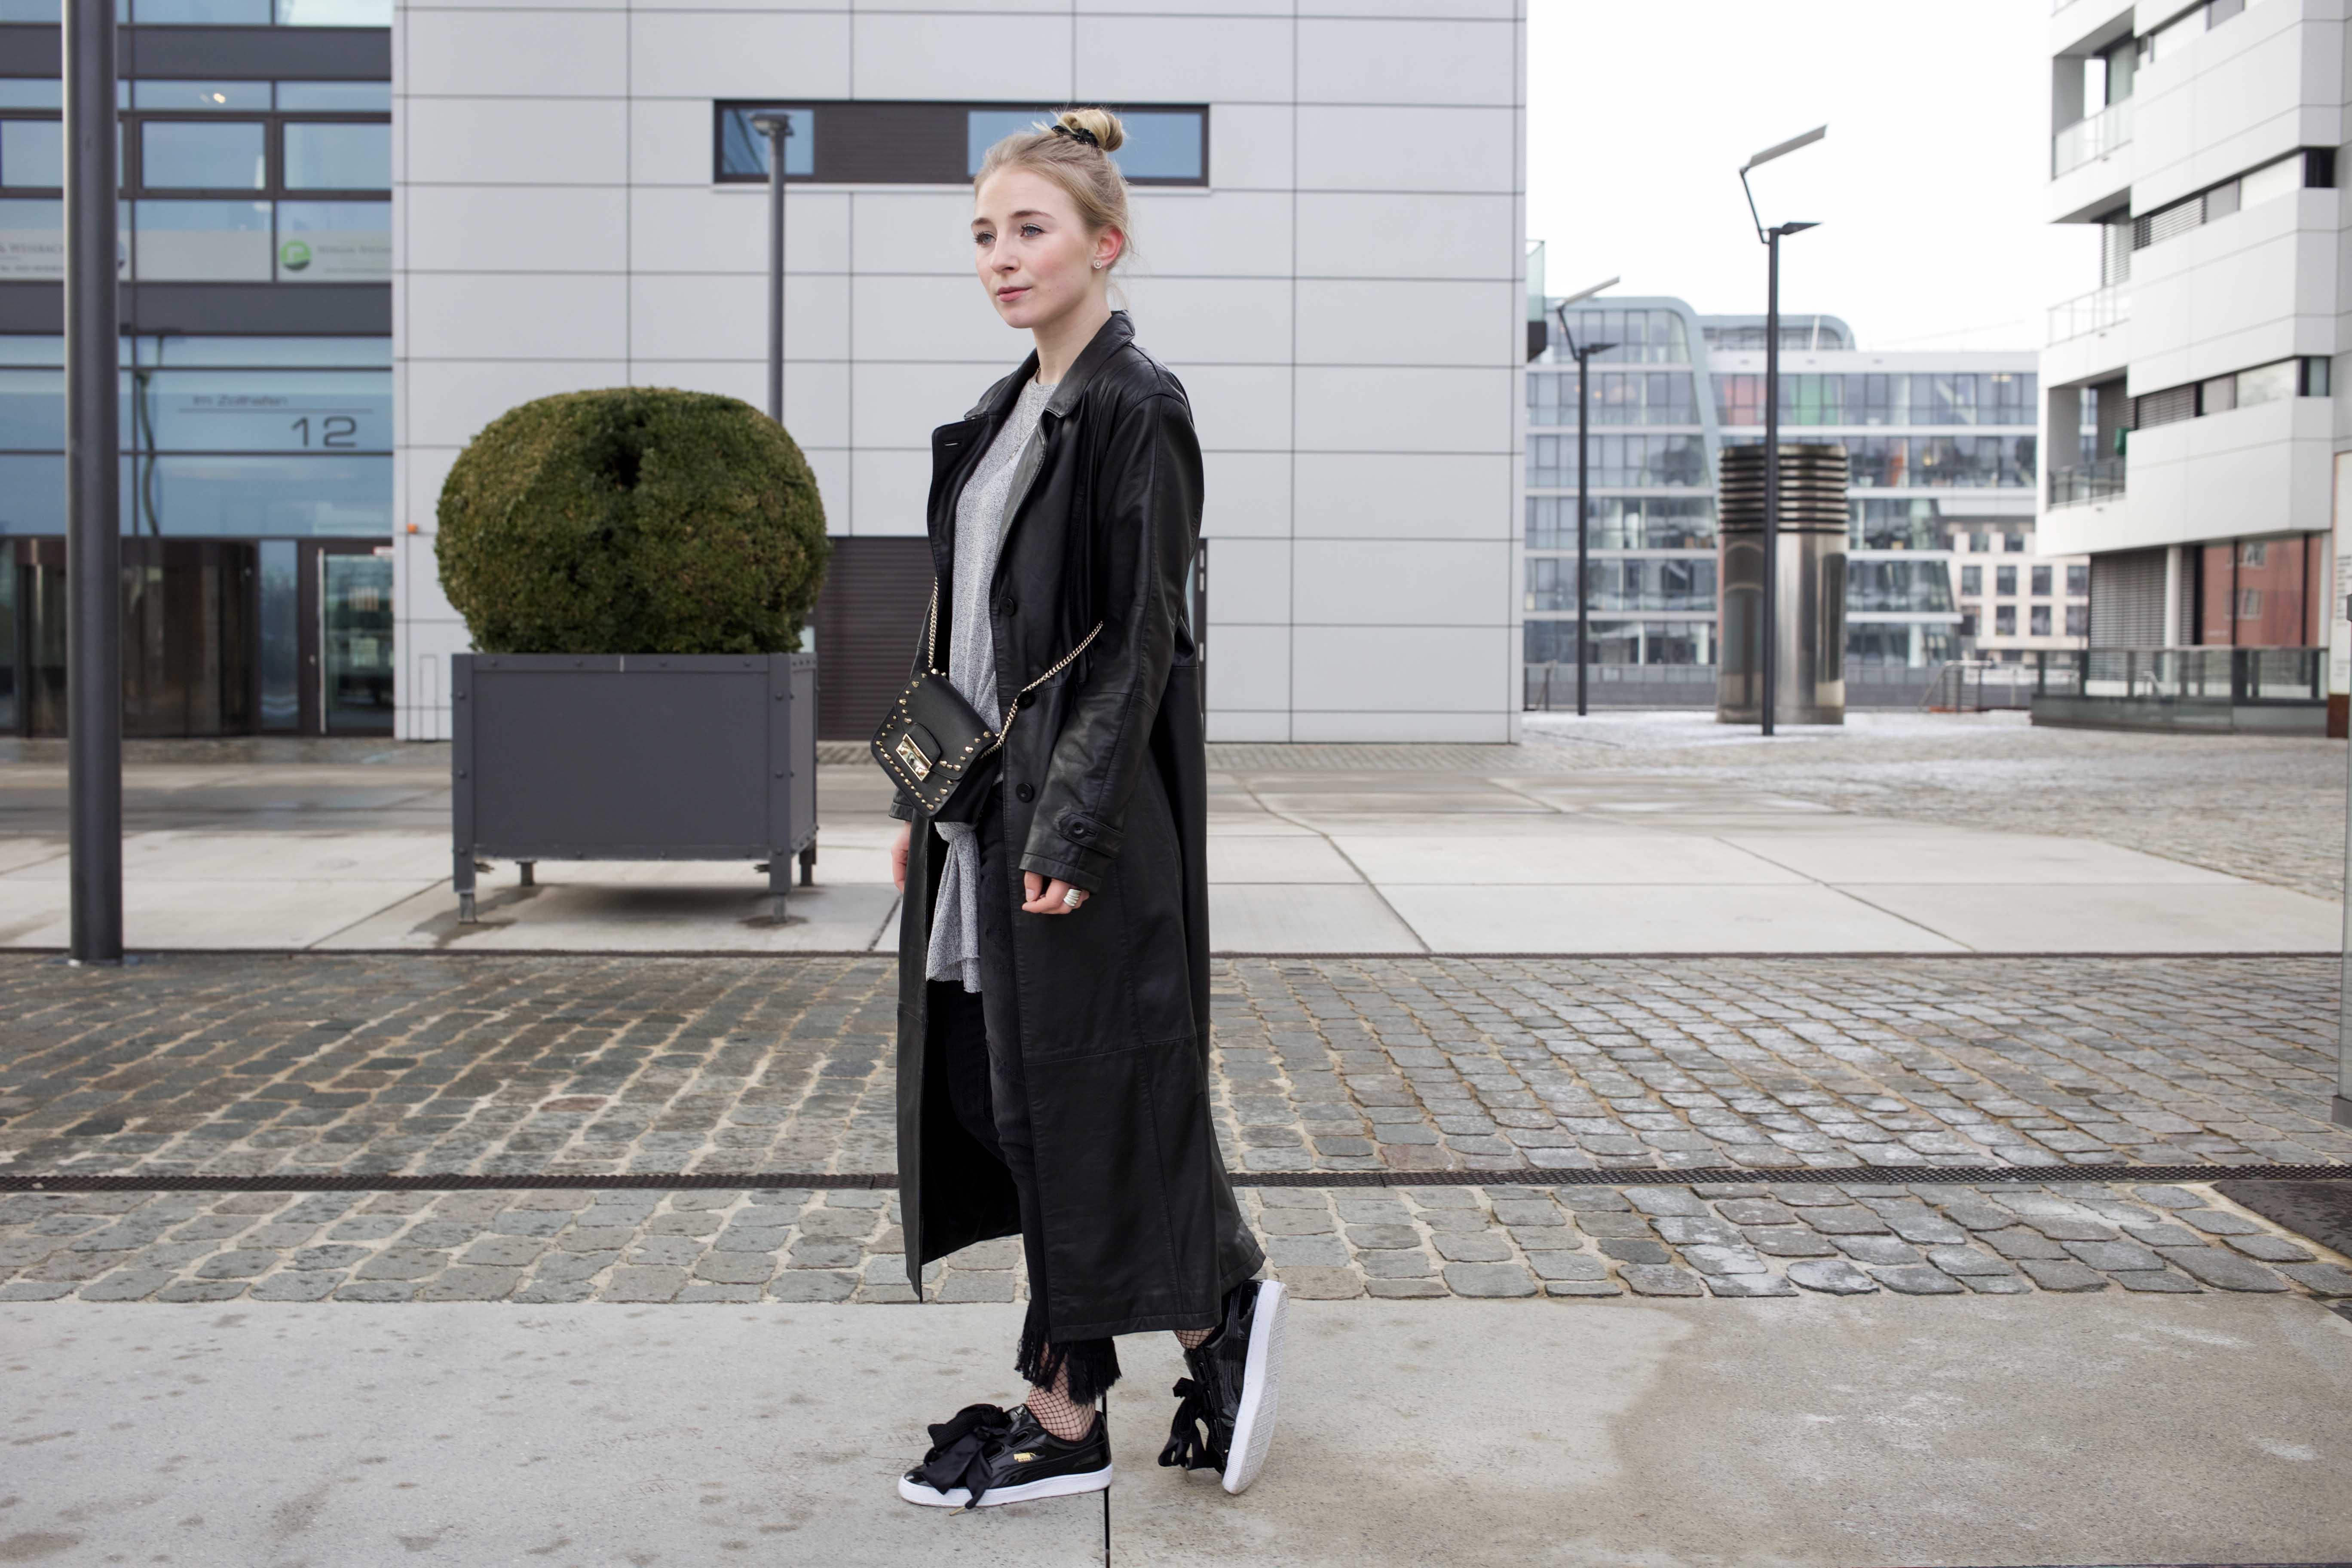 Netzstrumpfhose-kombinieren-Trend-Outfit-Fashionblog-PUMA-Basket-Ledermantel_9497